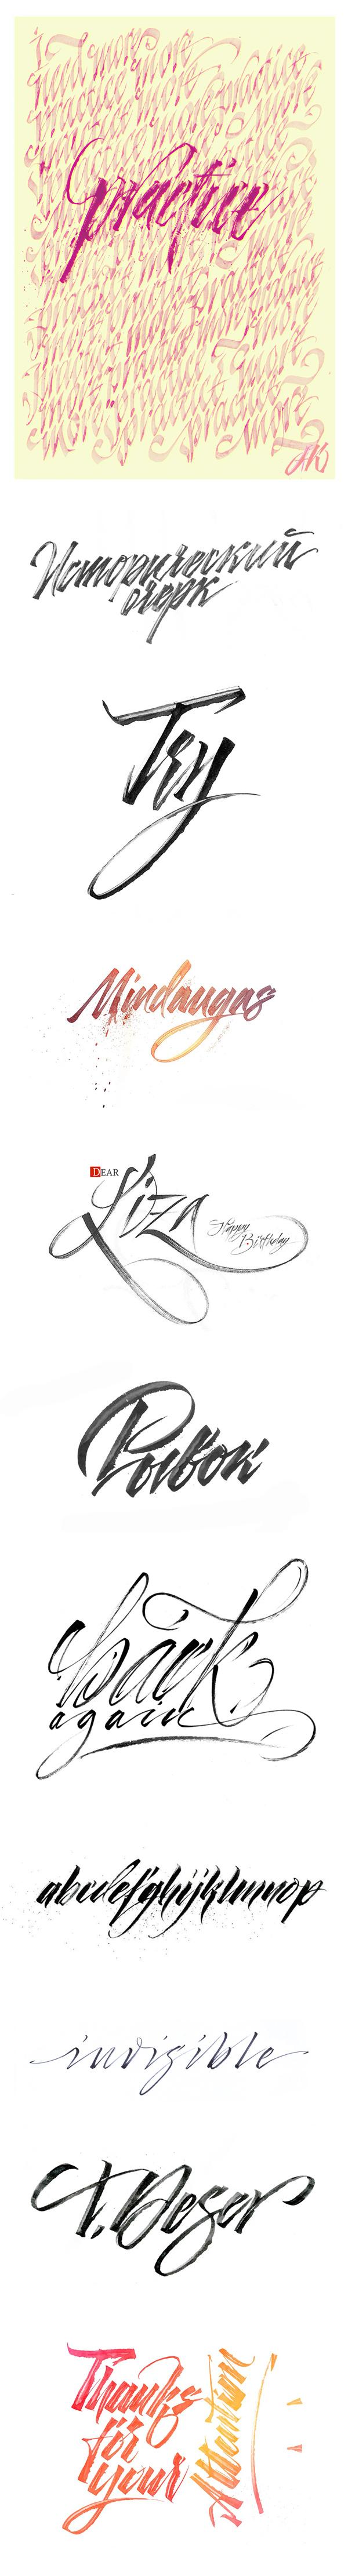 Calligrapgy 2012 by Alexander Kontarev, via Behance